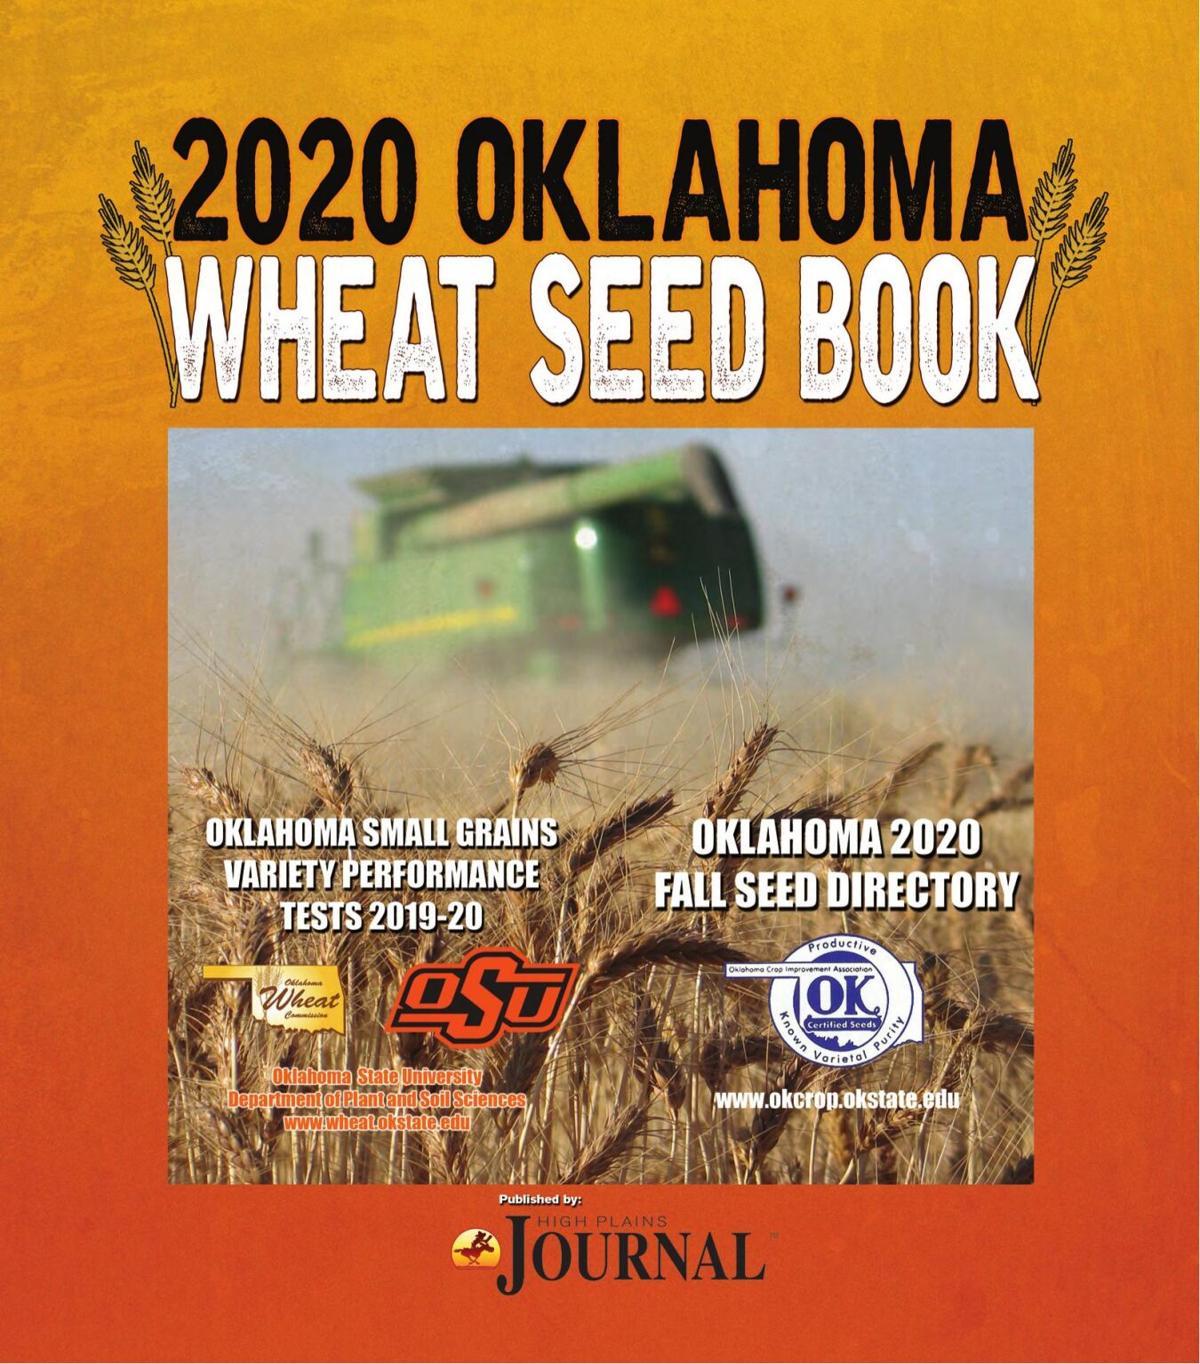 2020 Oklahoma Wheat Seed Book